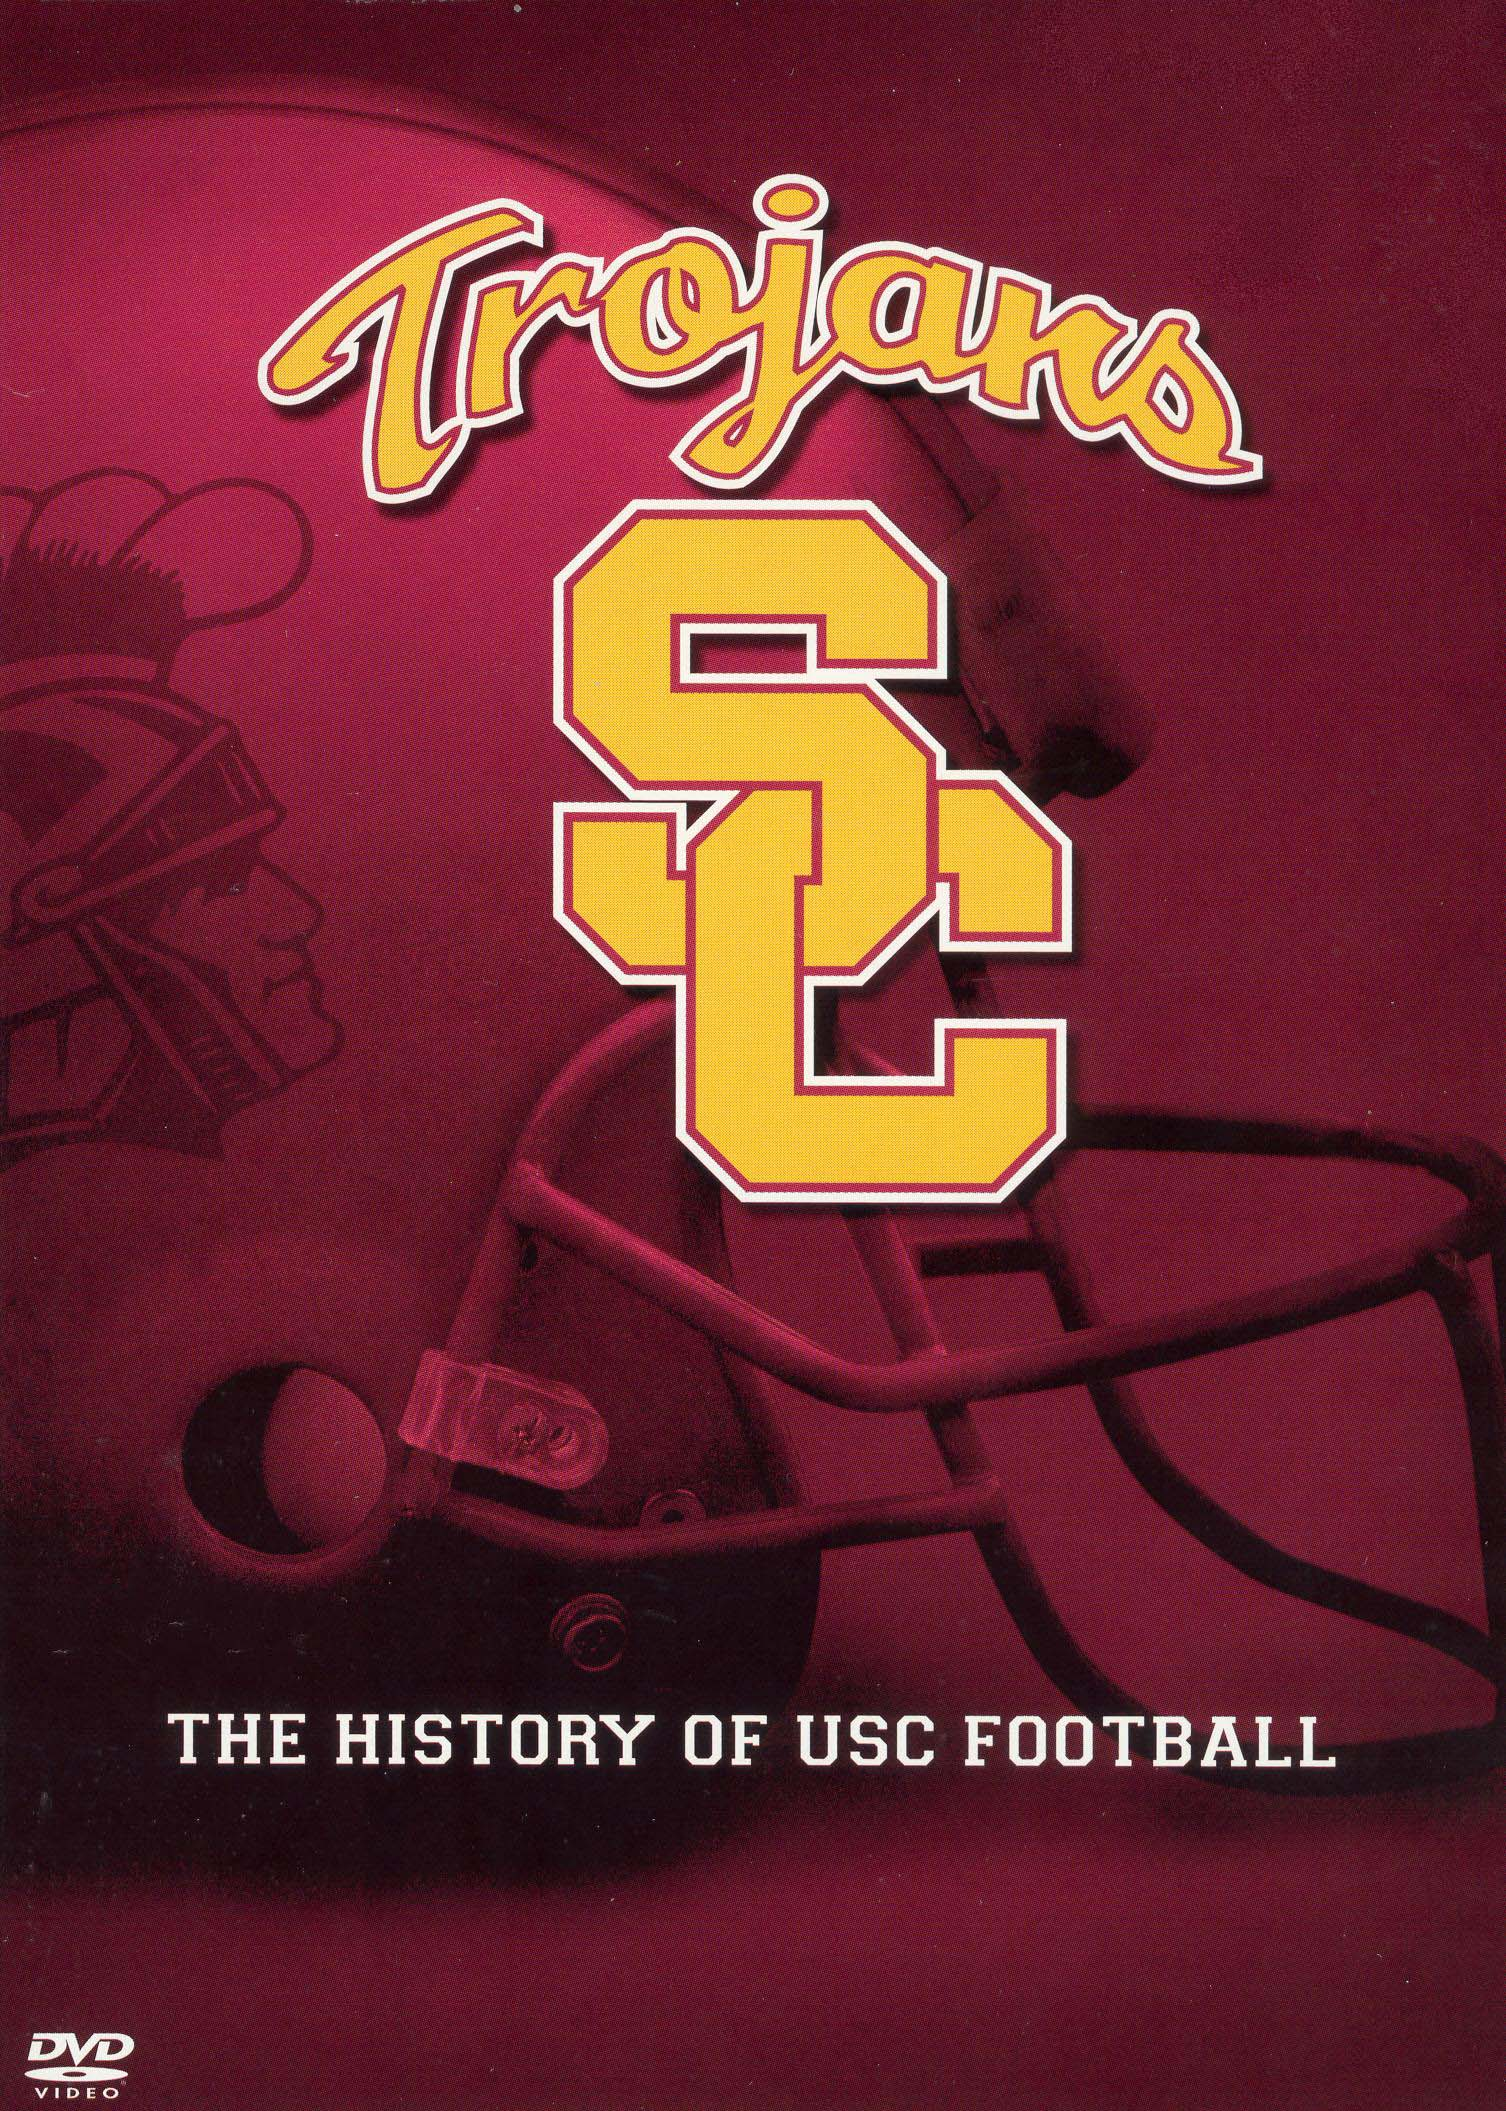 Trojans: The History of USC Football